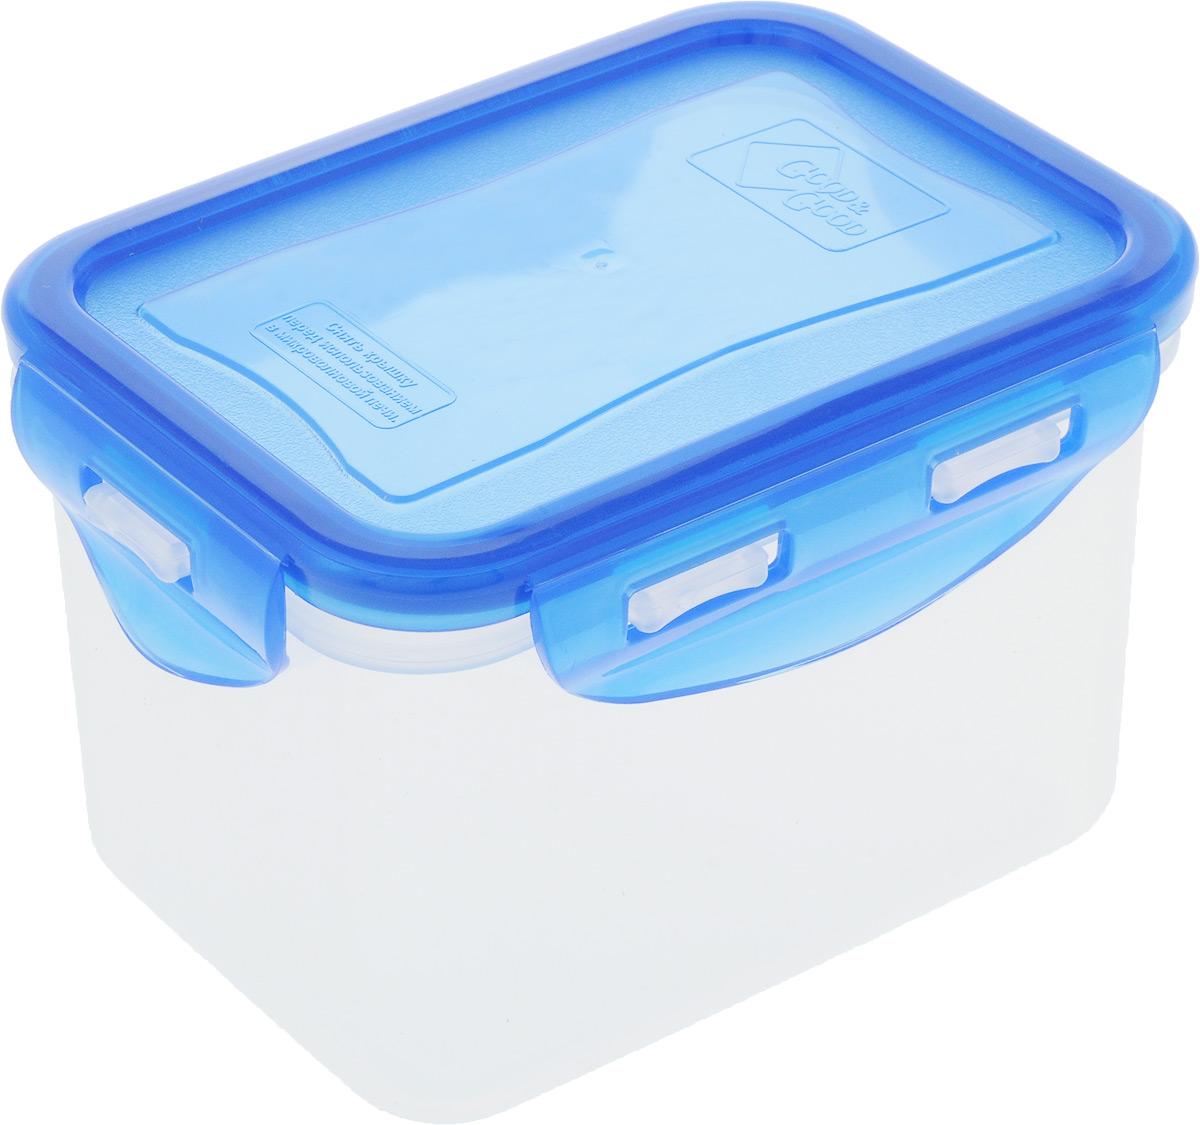 Контейнер пищевой Good&Good, цвет: прозрачный, синий, 630 мл. 02-2/COLORS lj41 04780a lj92 01454a good working tested